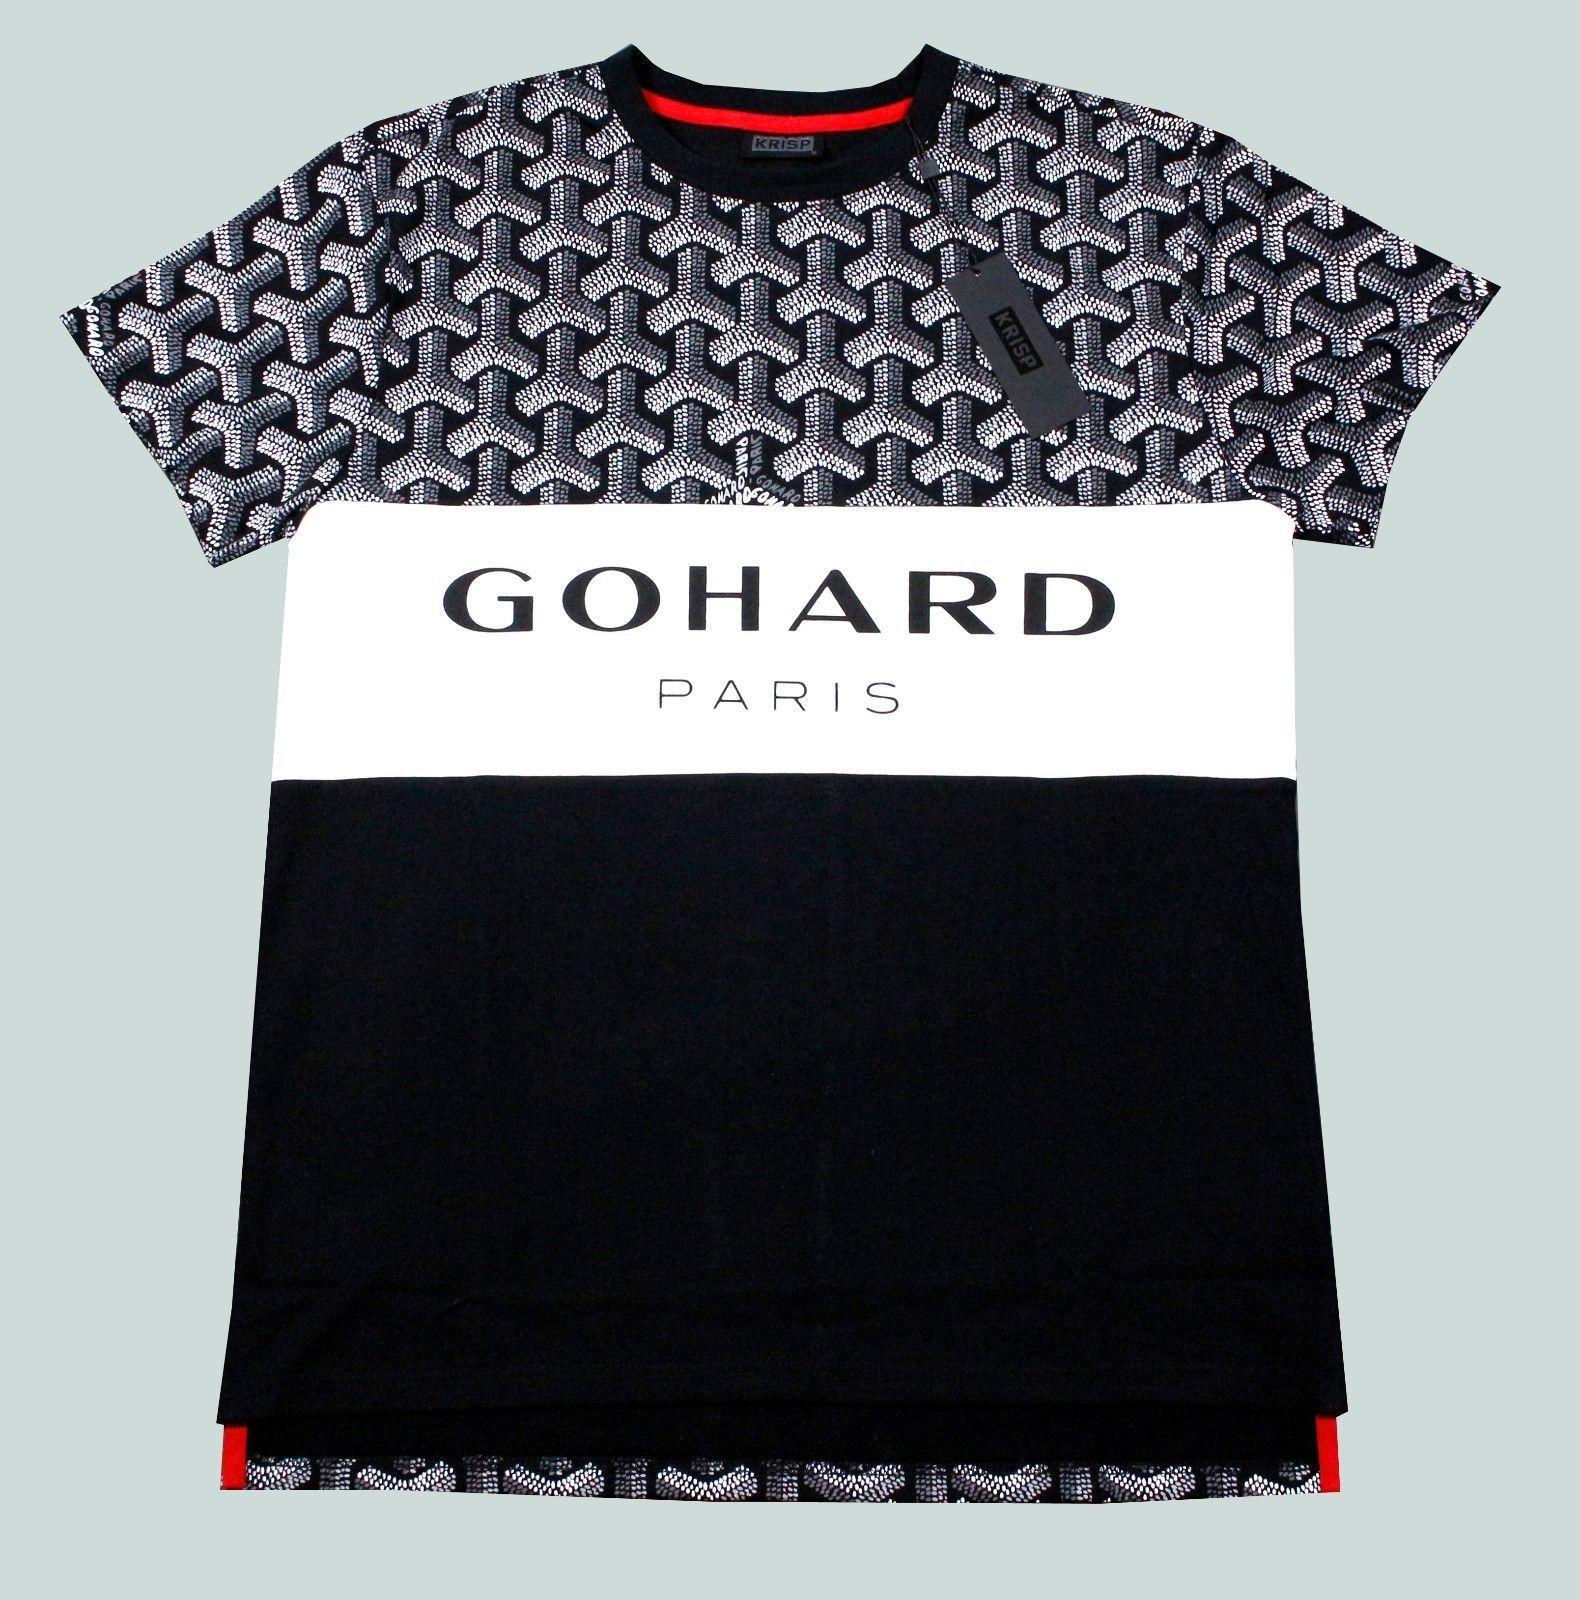 155dffdbe Men's Go Hard Paris Gucci Parody Goyard Print Tee Shirt M L XL 2X | eBay